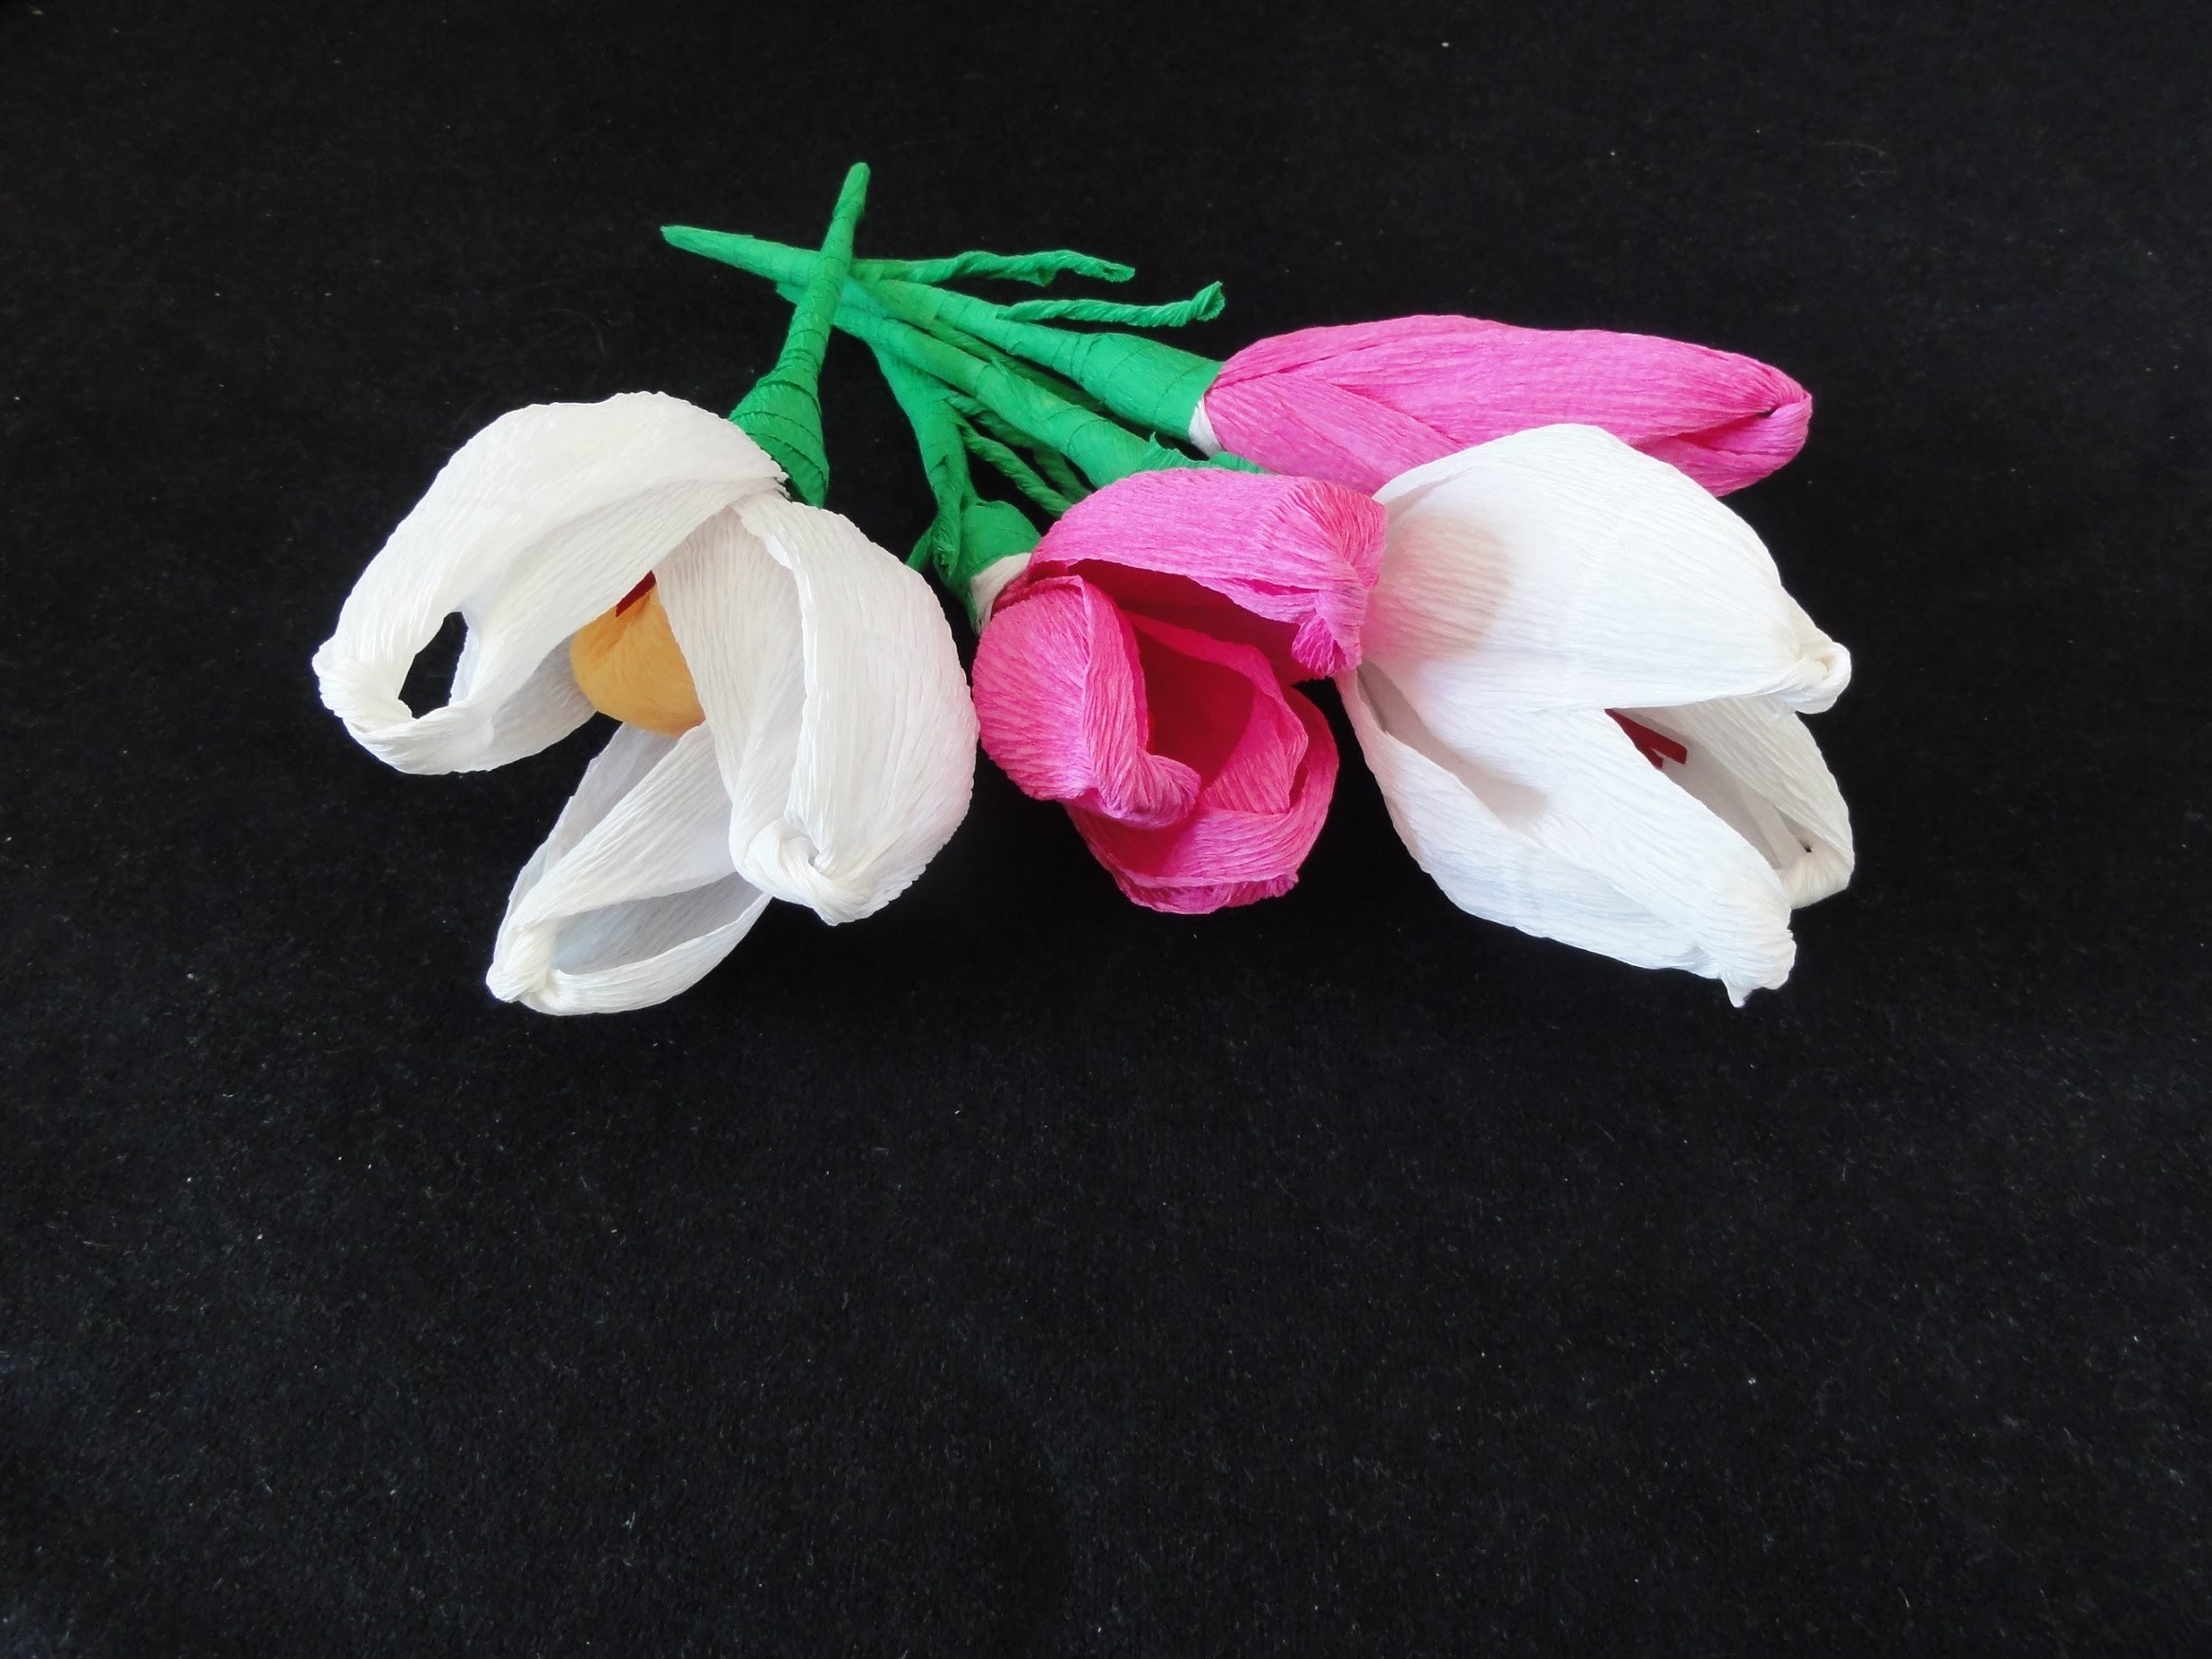 How to make crepe paper flowers - Tulpe basteln aus Krepppapier - Tulipan iz krep papirja -